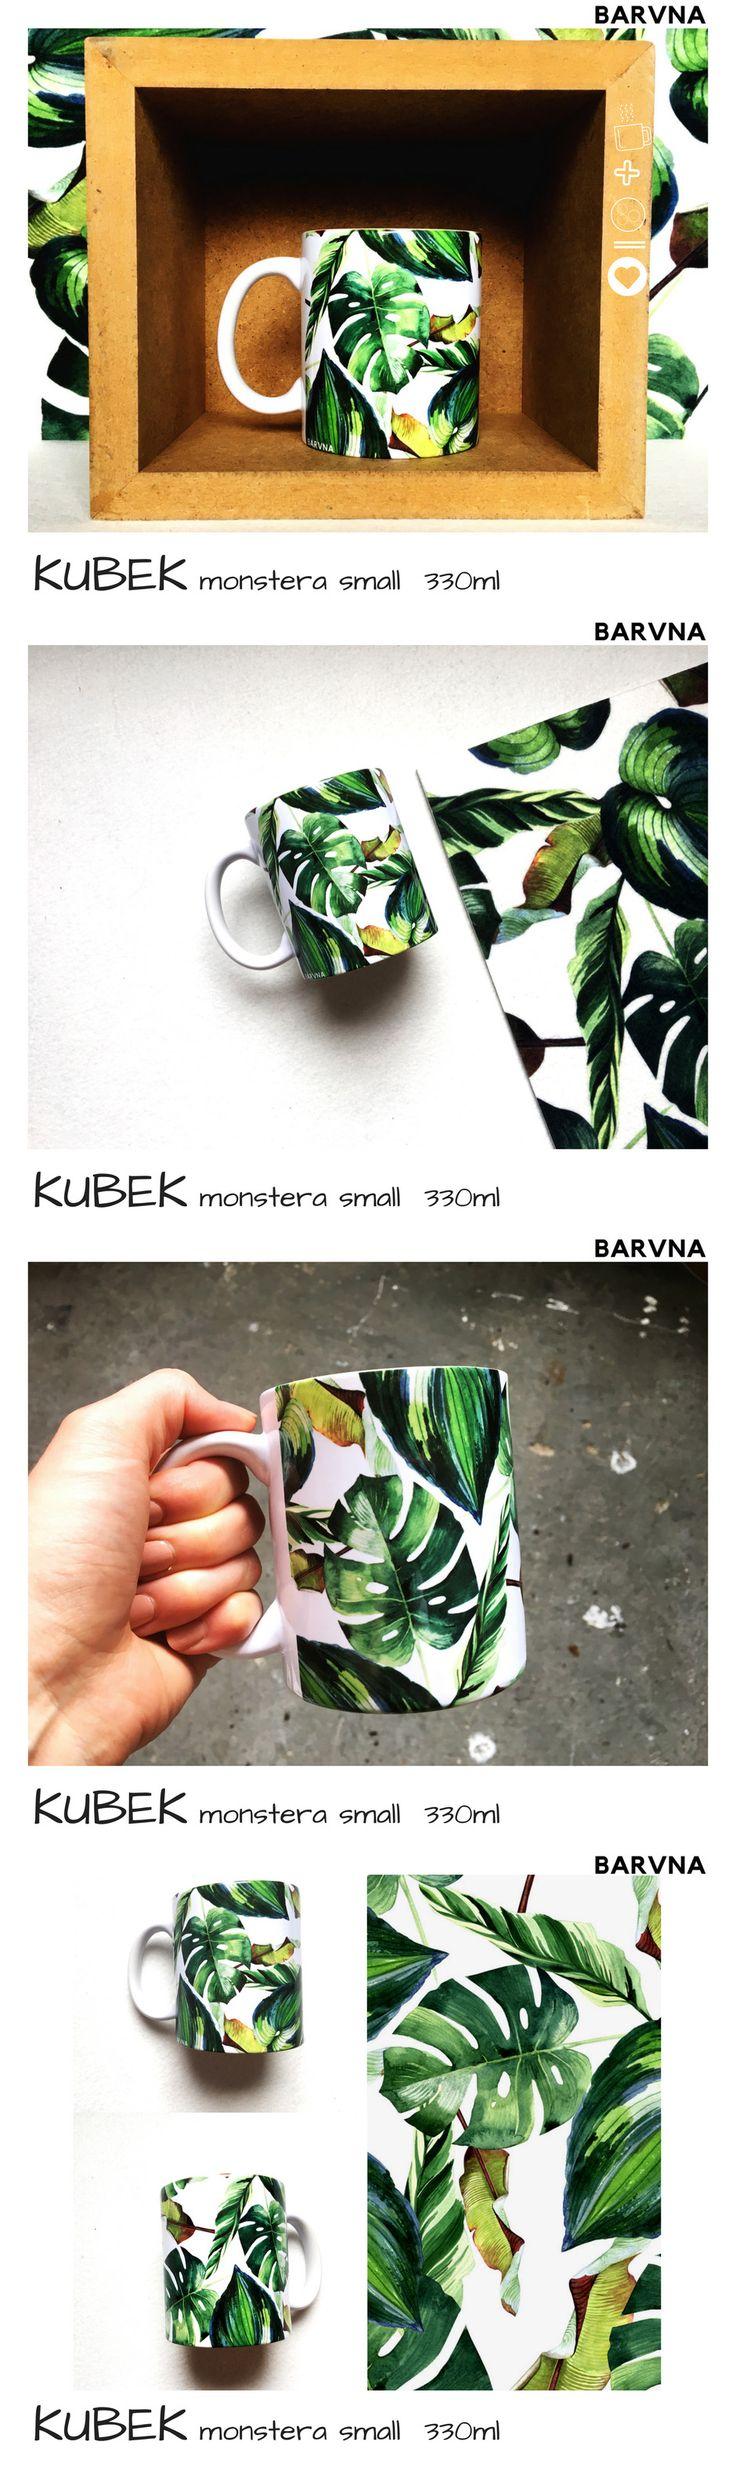 kubek monstera small cup  floral tropic leafs liście tropikalny